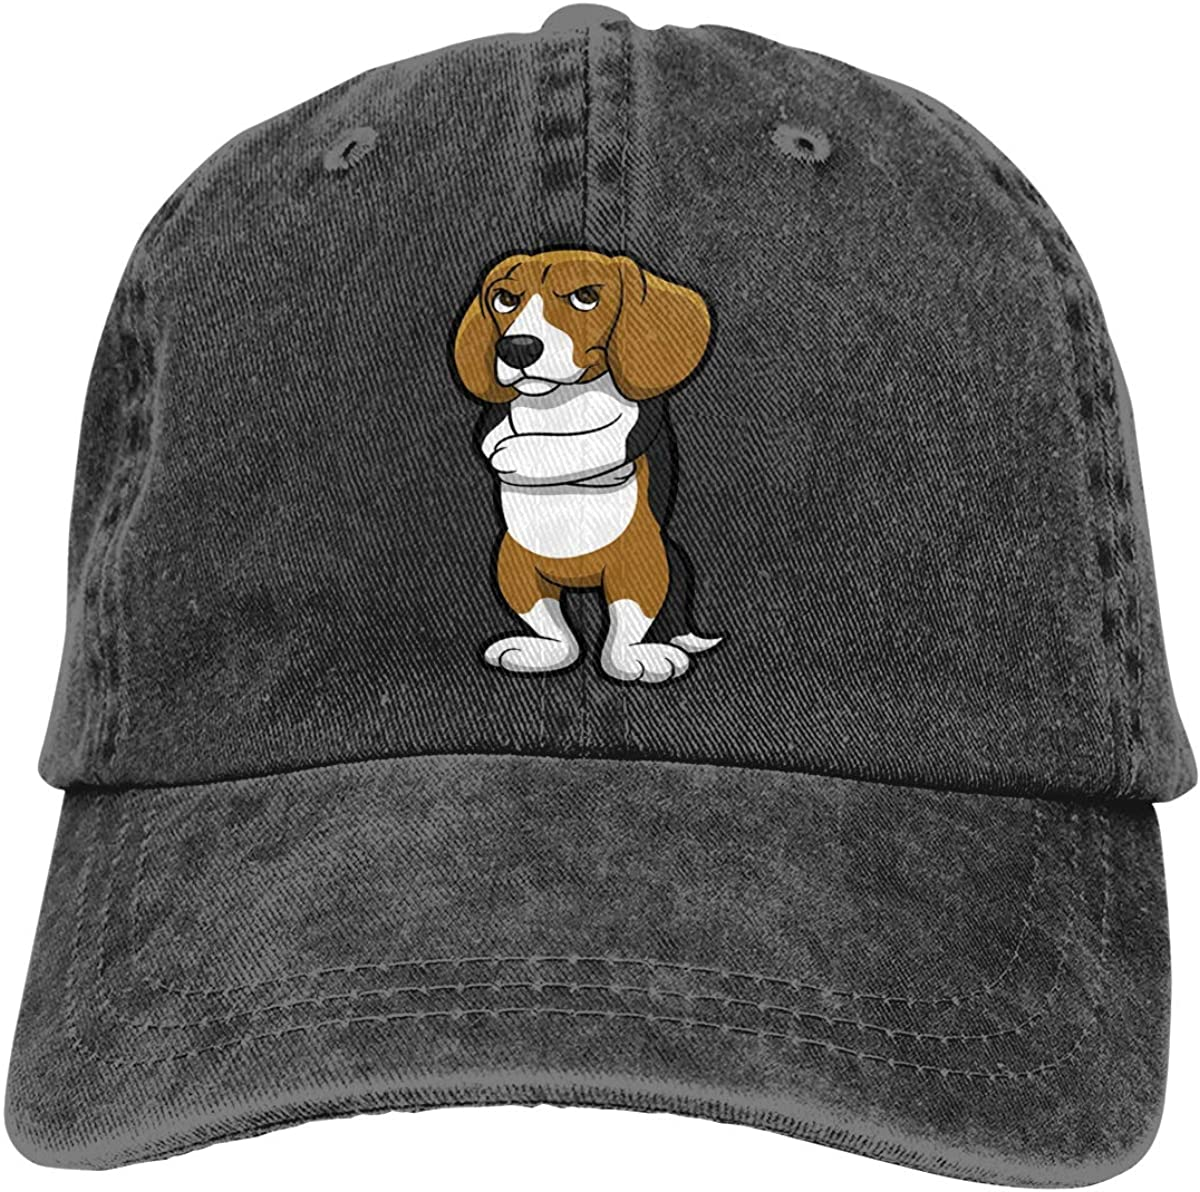 GAOFEIhat Beagle Unisex Adult Denim Hats Cowboy Hat Dad Hat Driver Cap